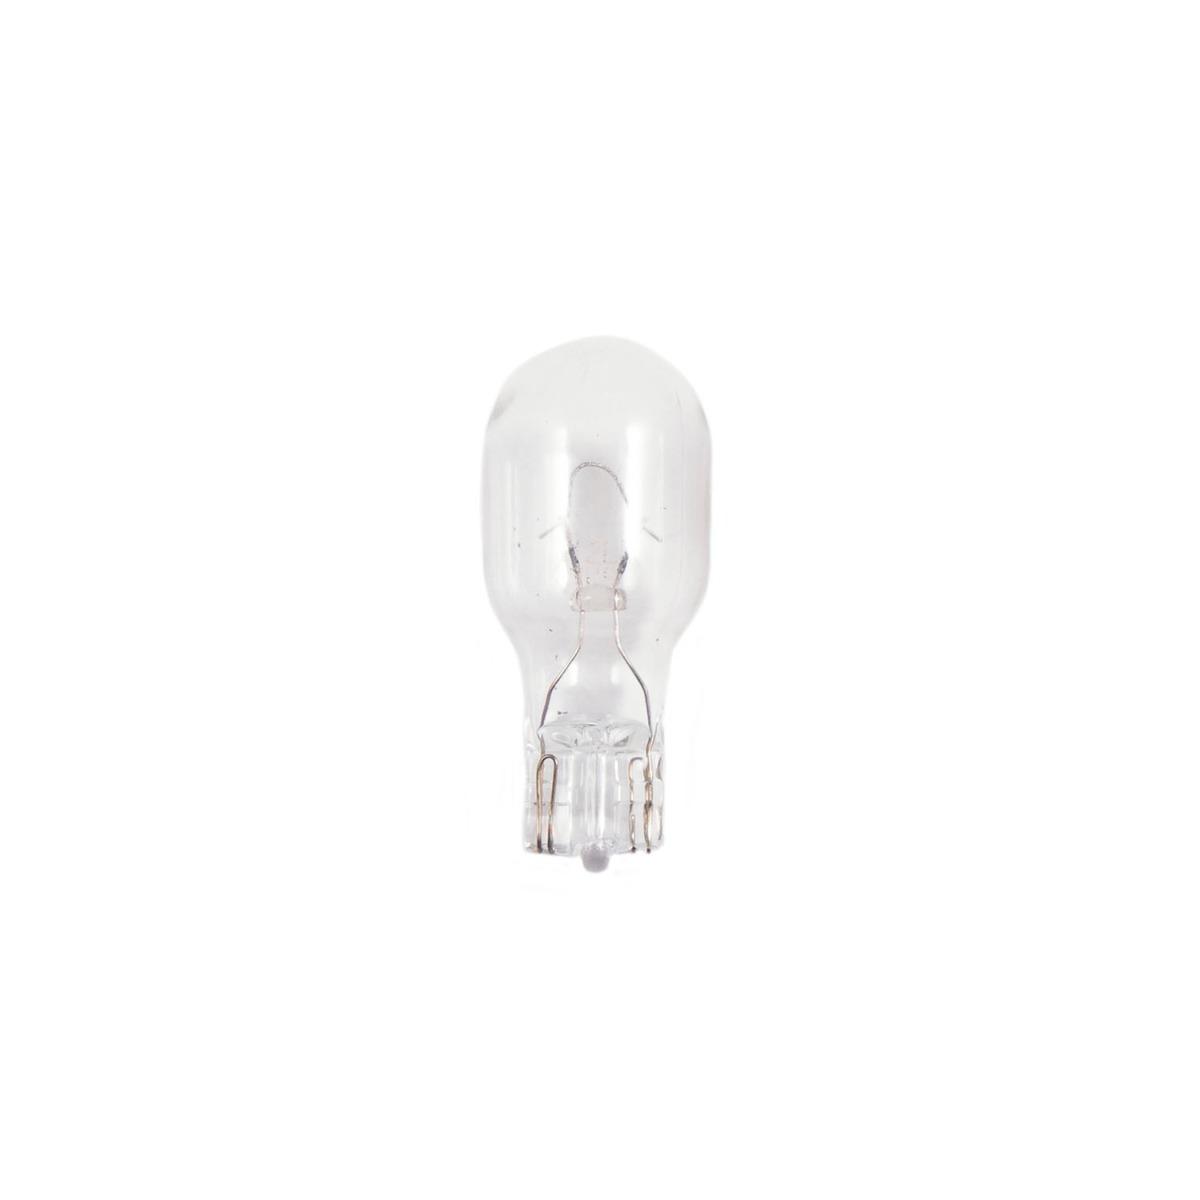 921 stock bulb